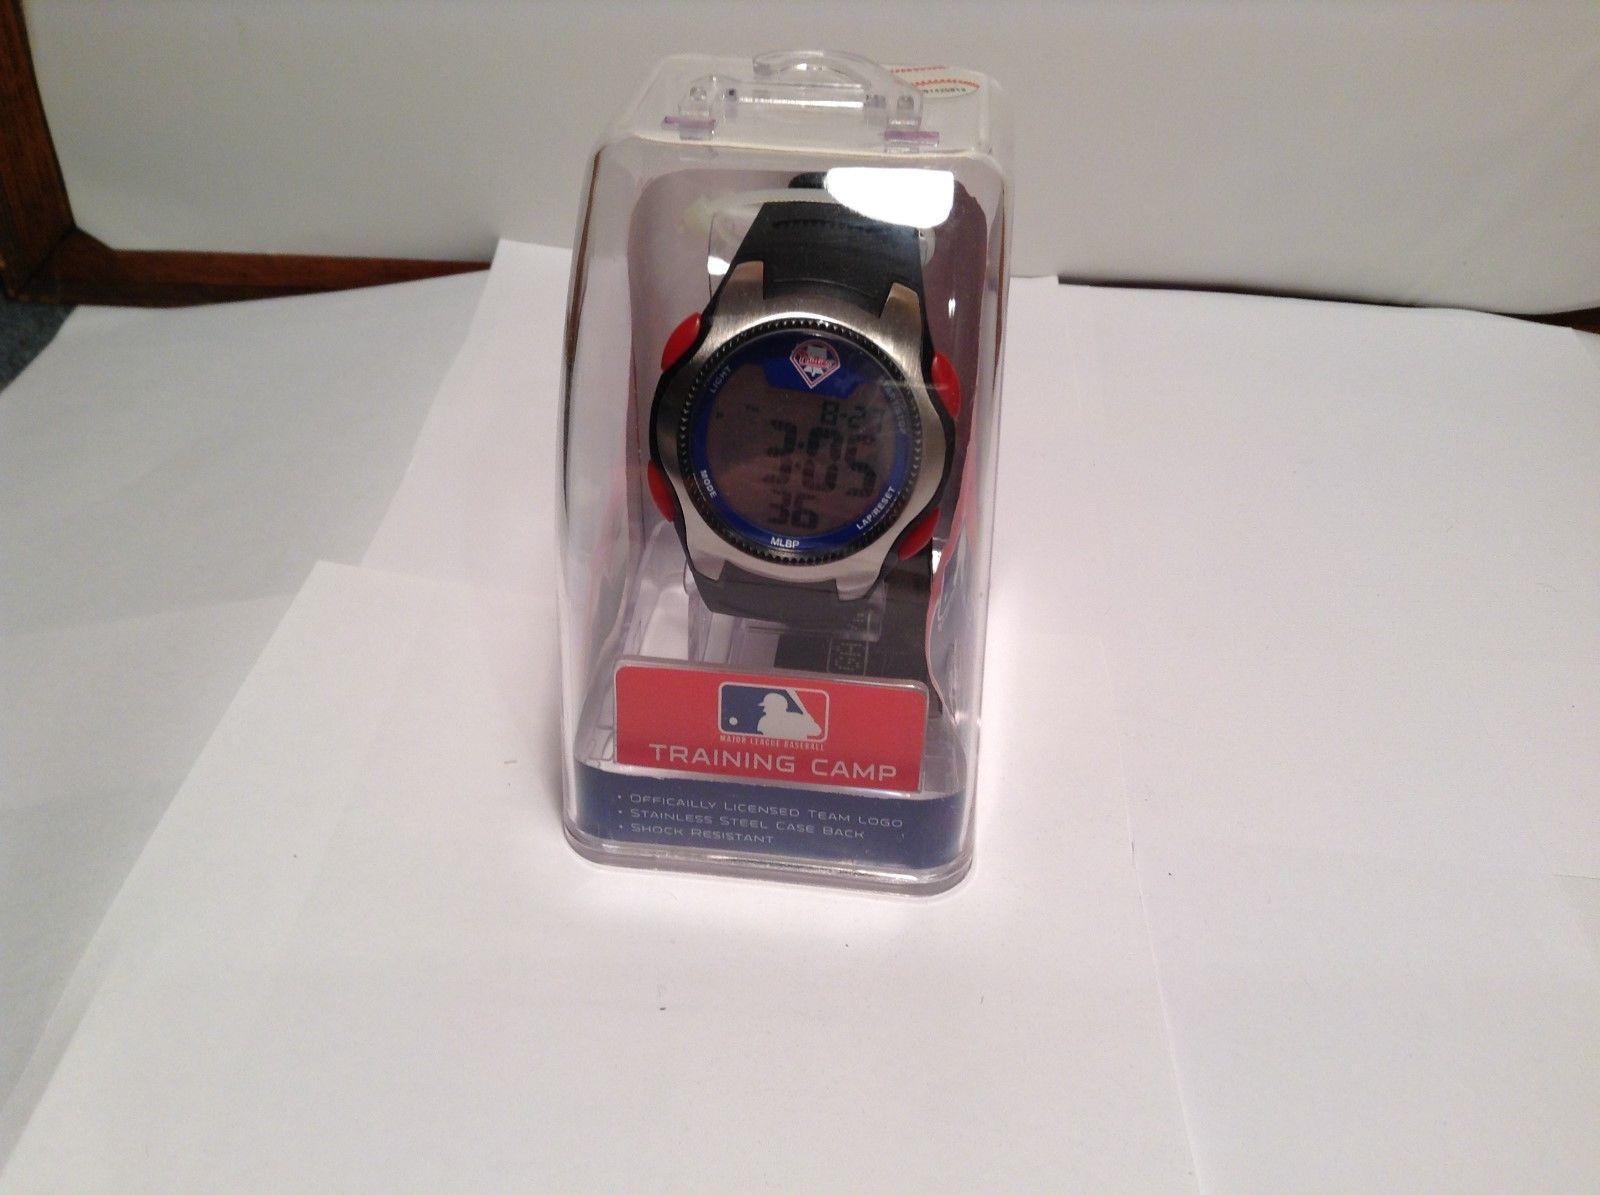 NEW MLB Phillies Training Camp Round Digital Wristwatch